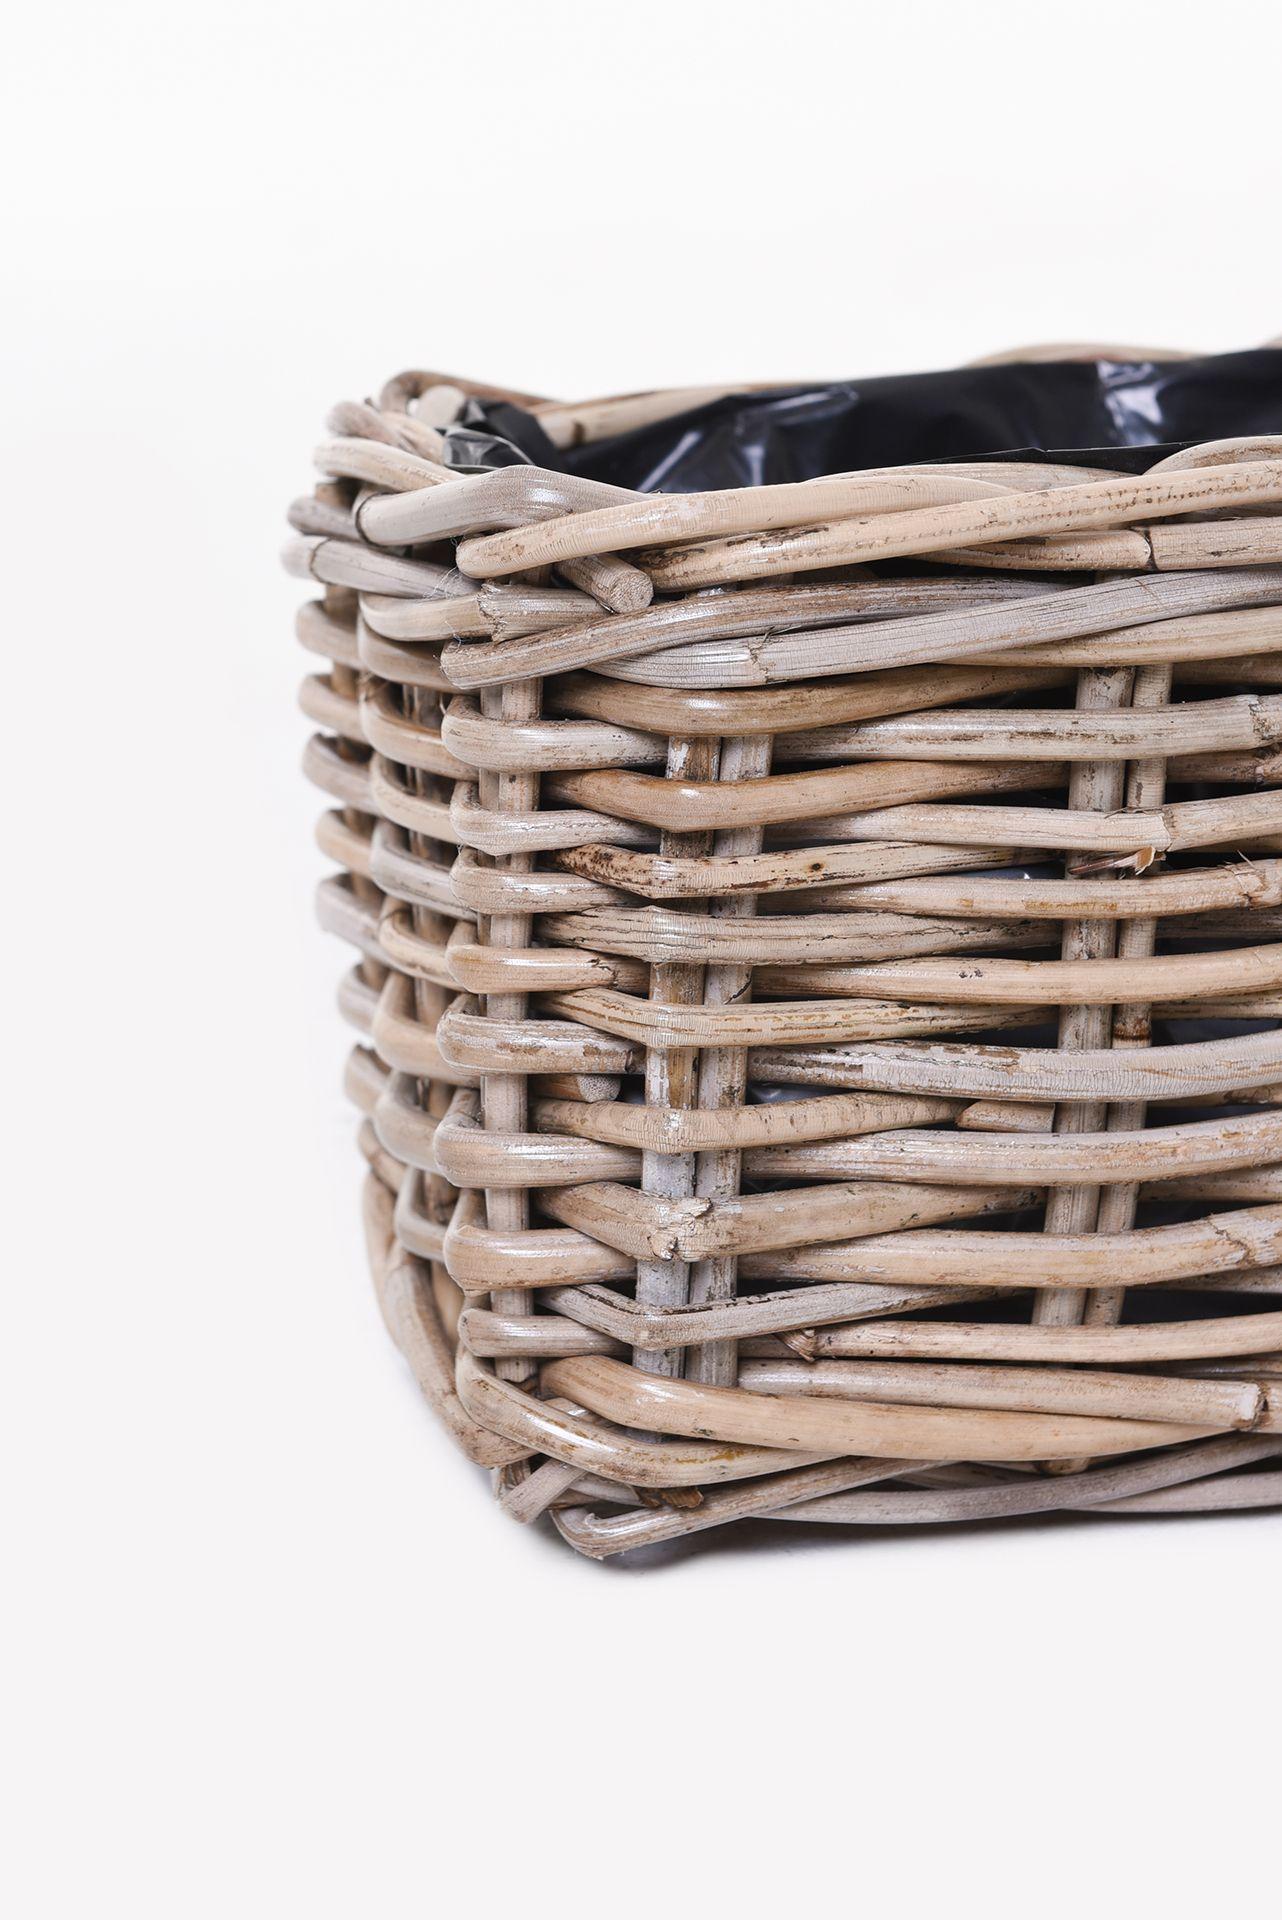 blumenkasten fensterbankkasten pflanzkasten rattan pianta 80 cm koobo grey ebay. Black Bedroom Furniture Sets. Home Design Ideas